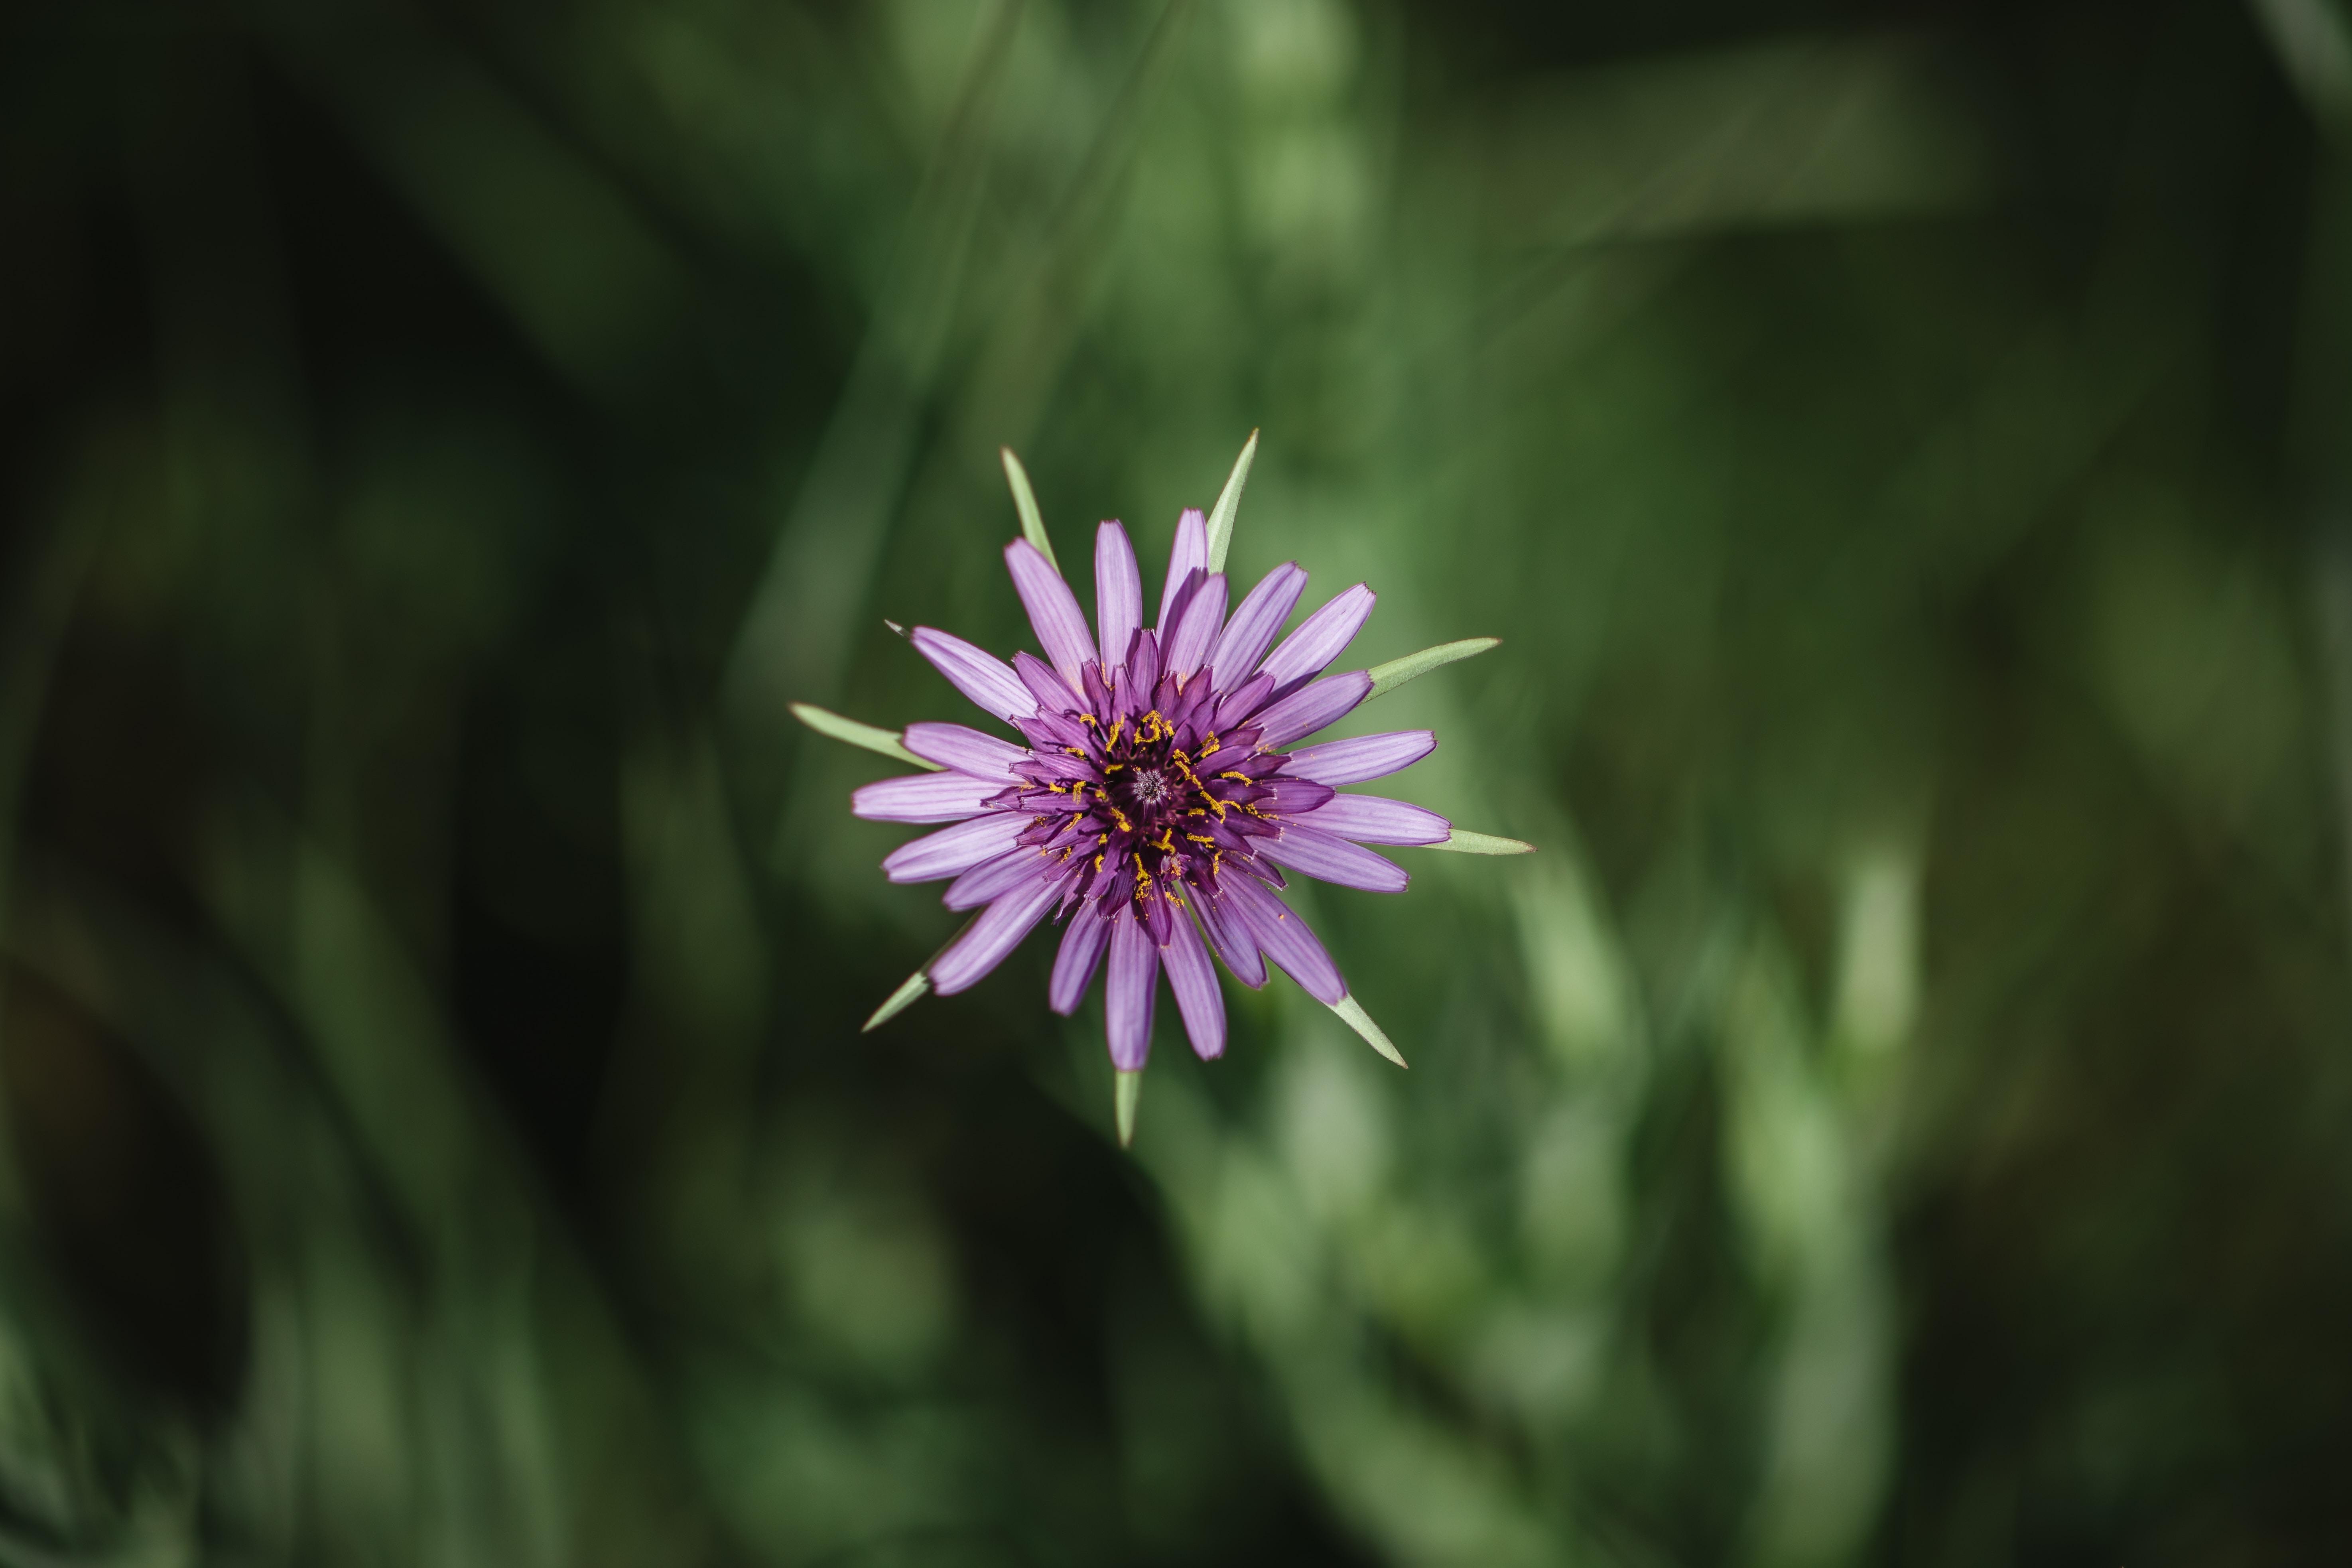 photo of purple flower